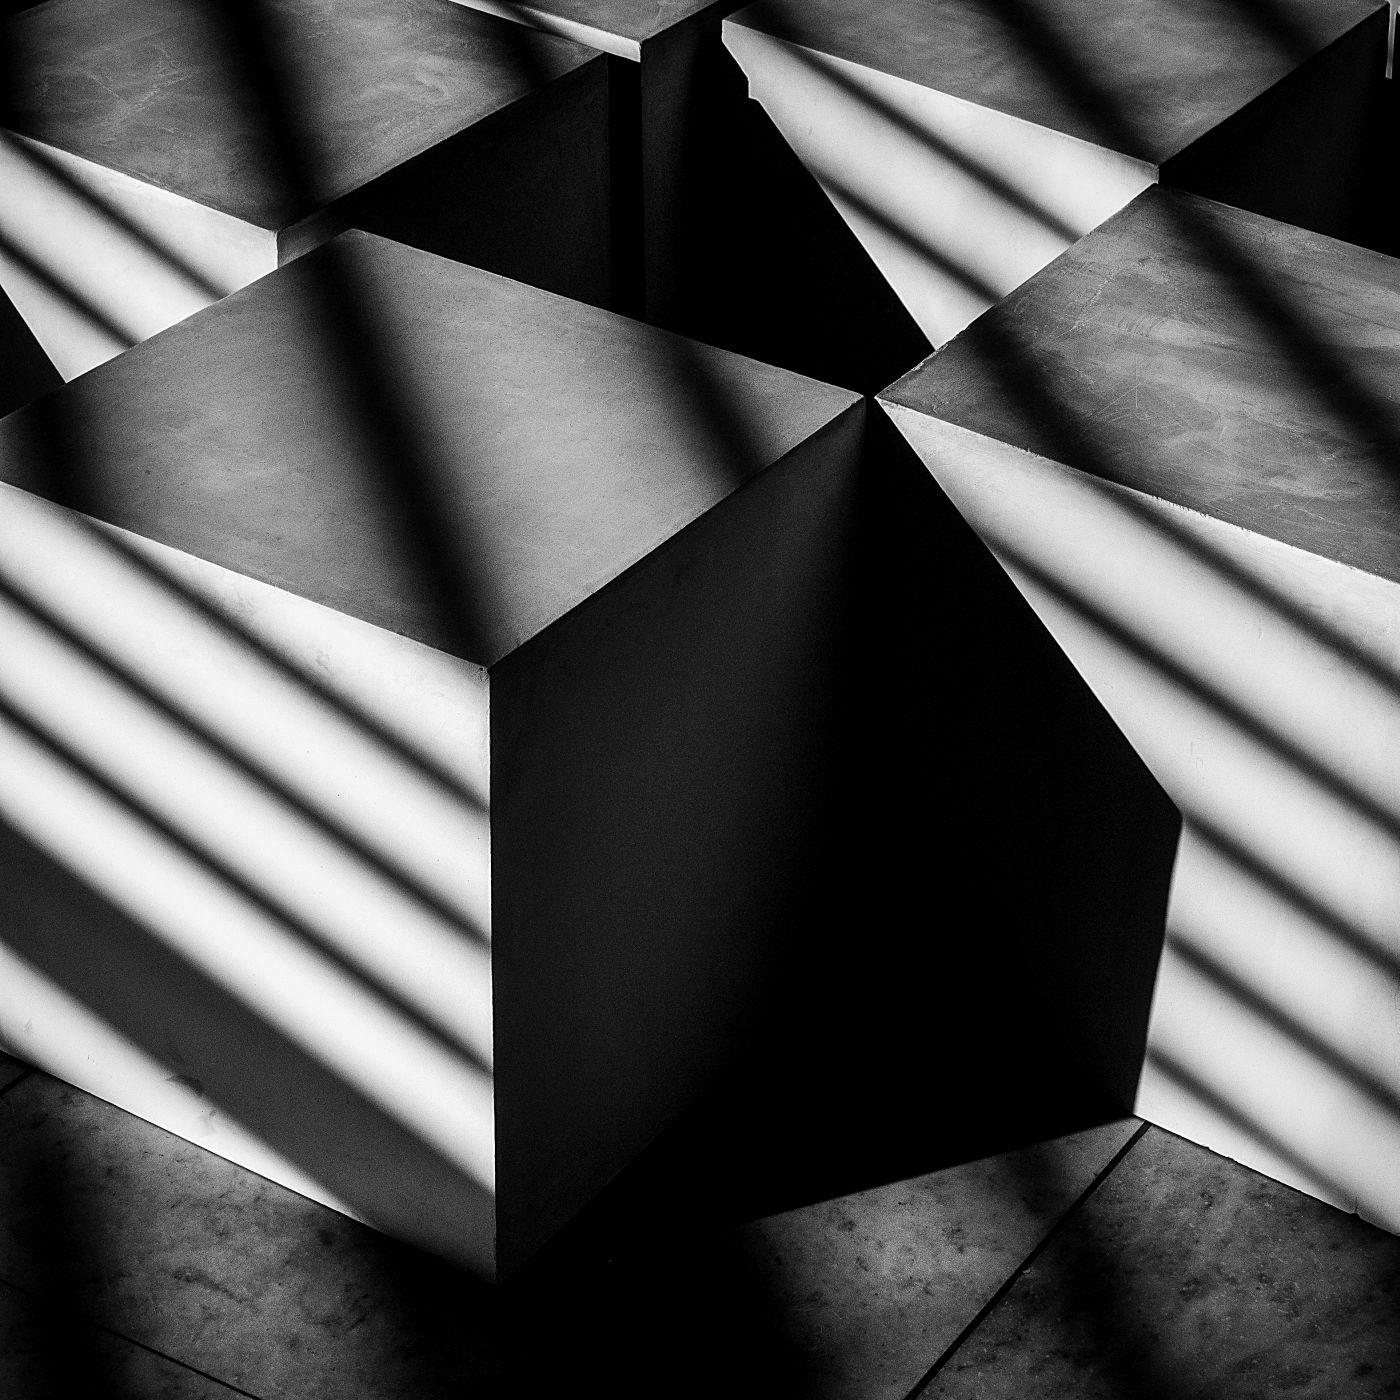 Schattenspiele #05 | © wolfgang röser | worobo